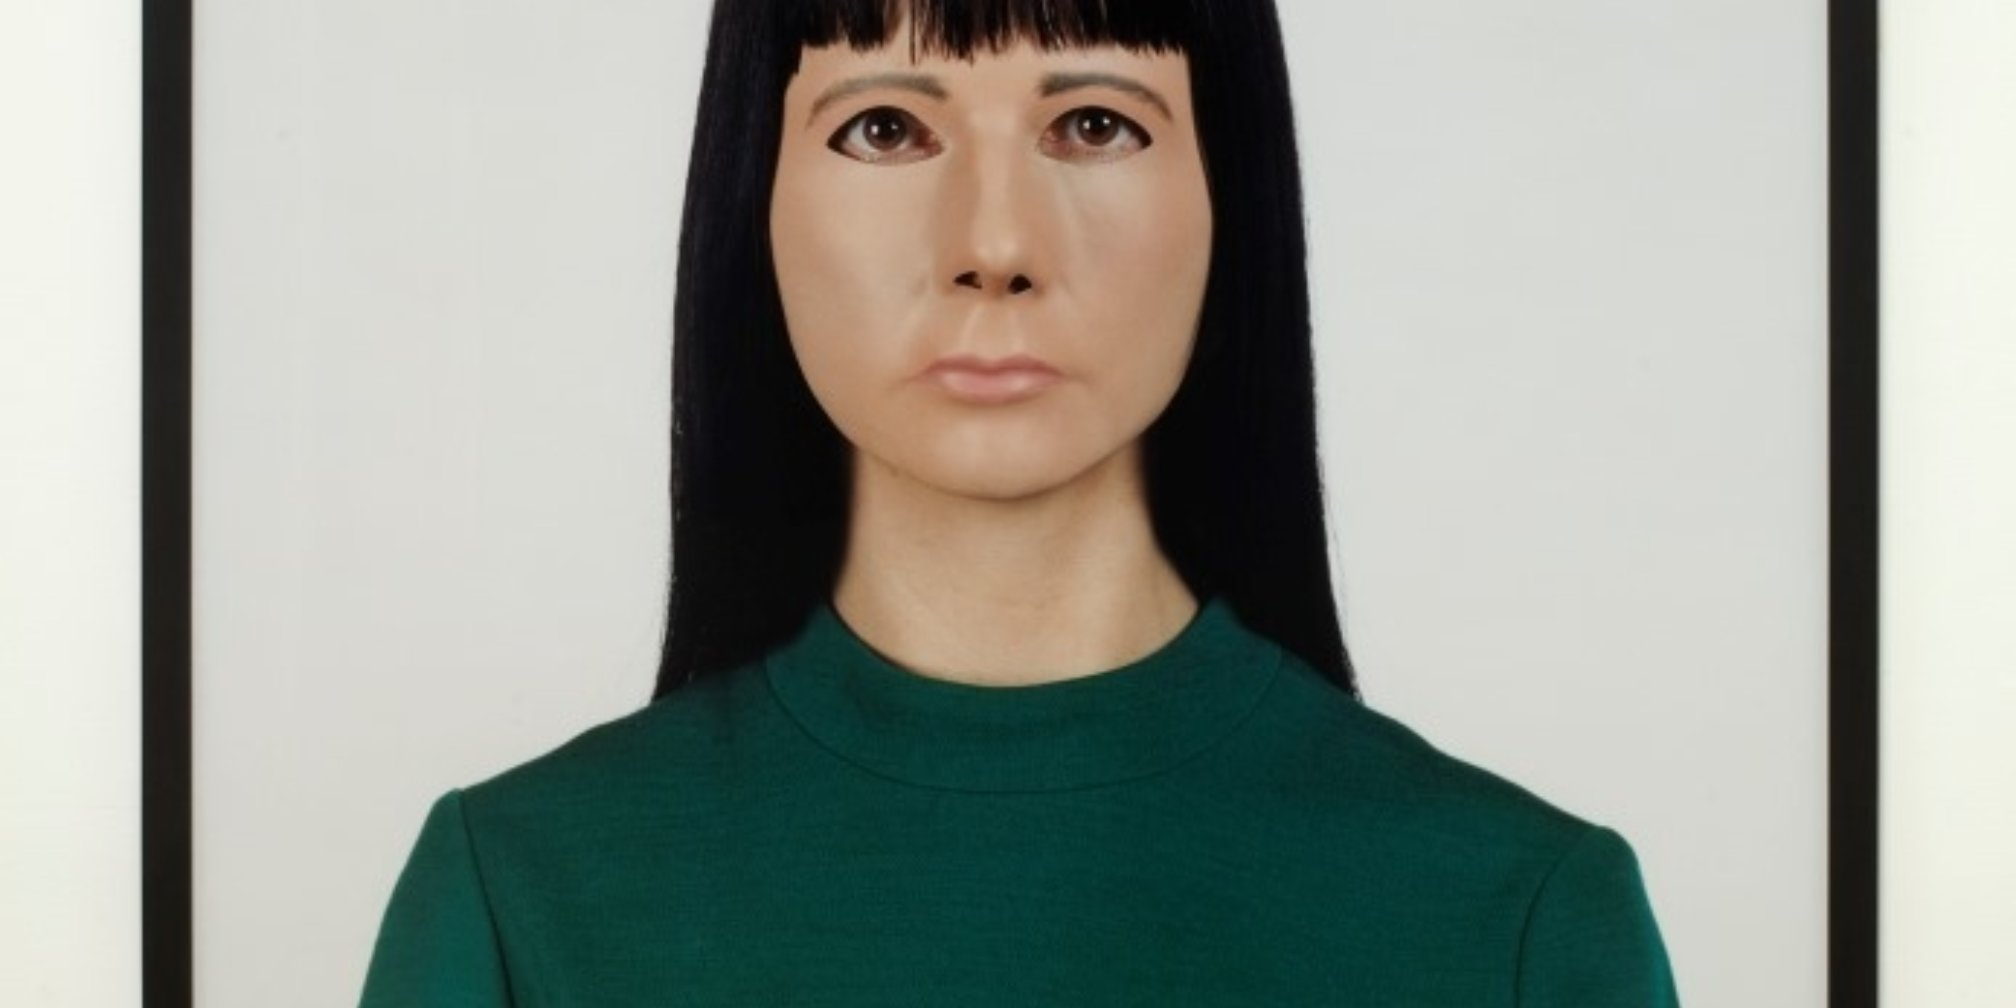 Gillian Wearing, Self Portrait, 2000 (installation view)